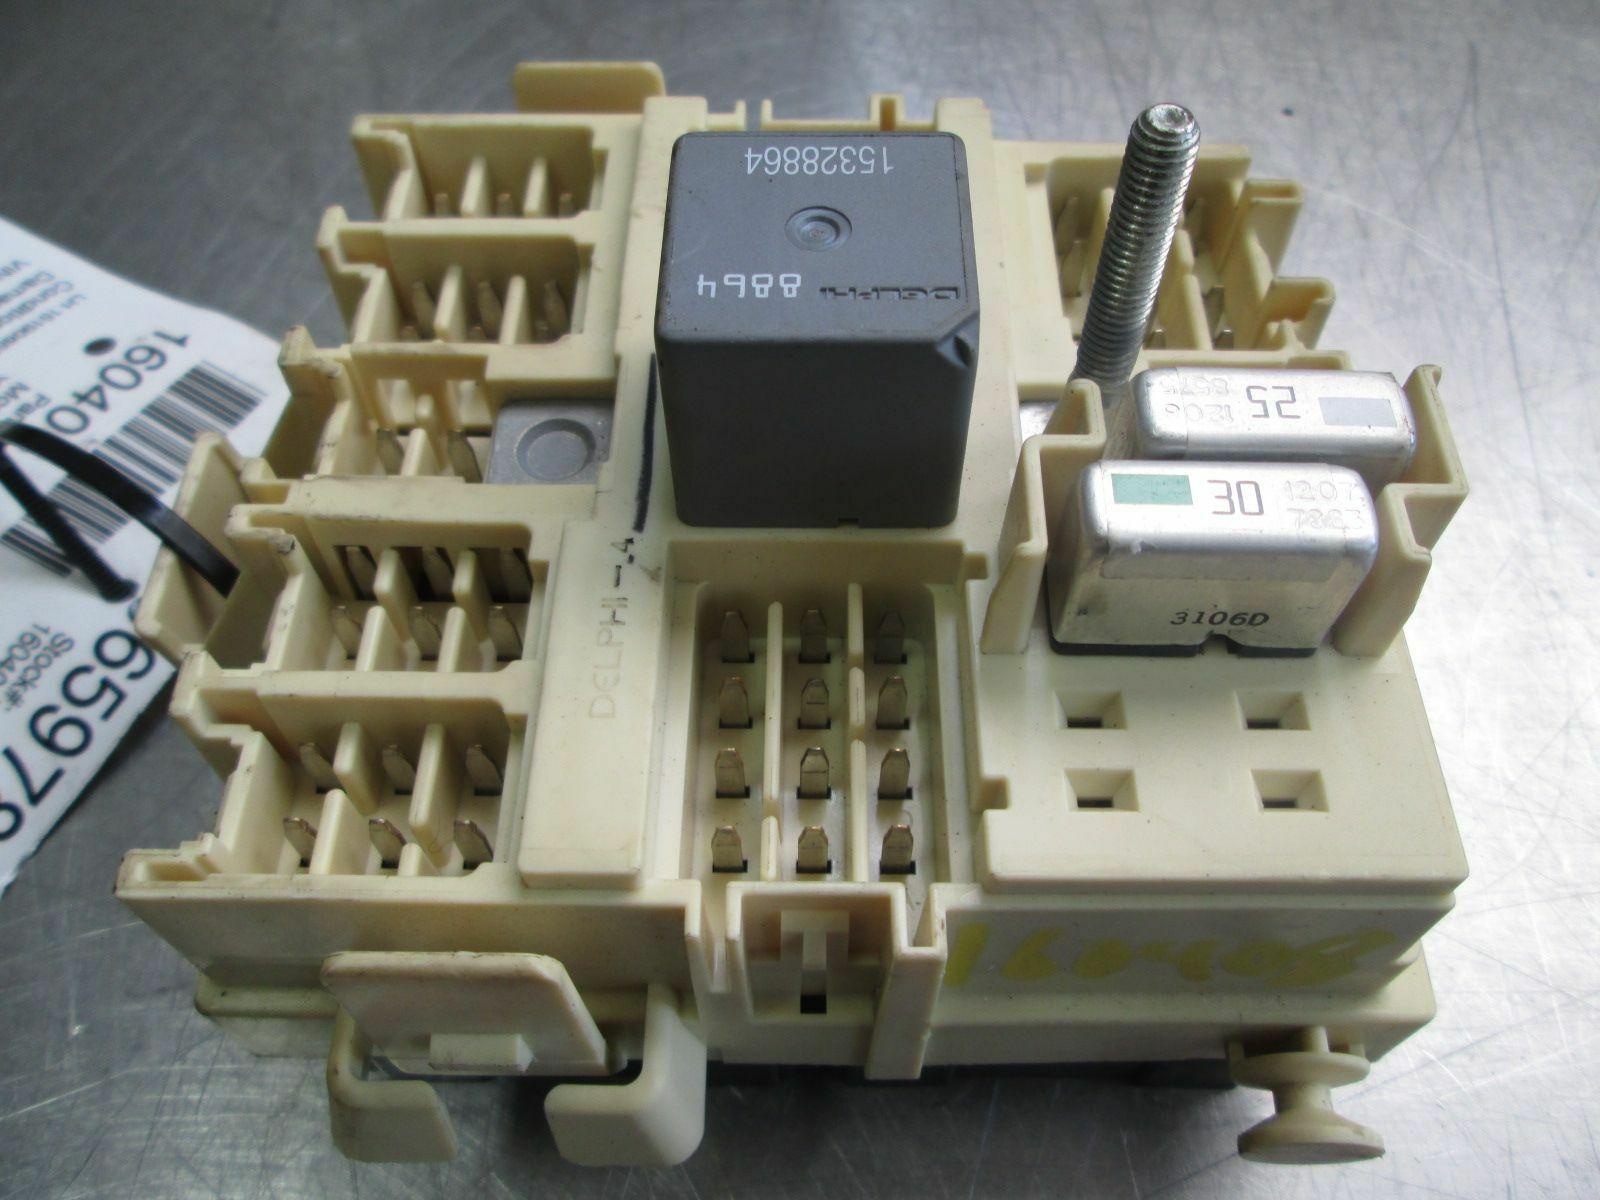 1996 hummer fuse box diagram schematic rh yomelaniejo co 1996 Hummer H1 2004 Hummer